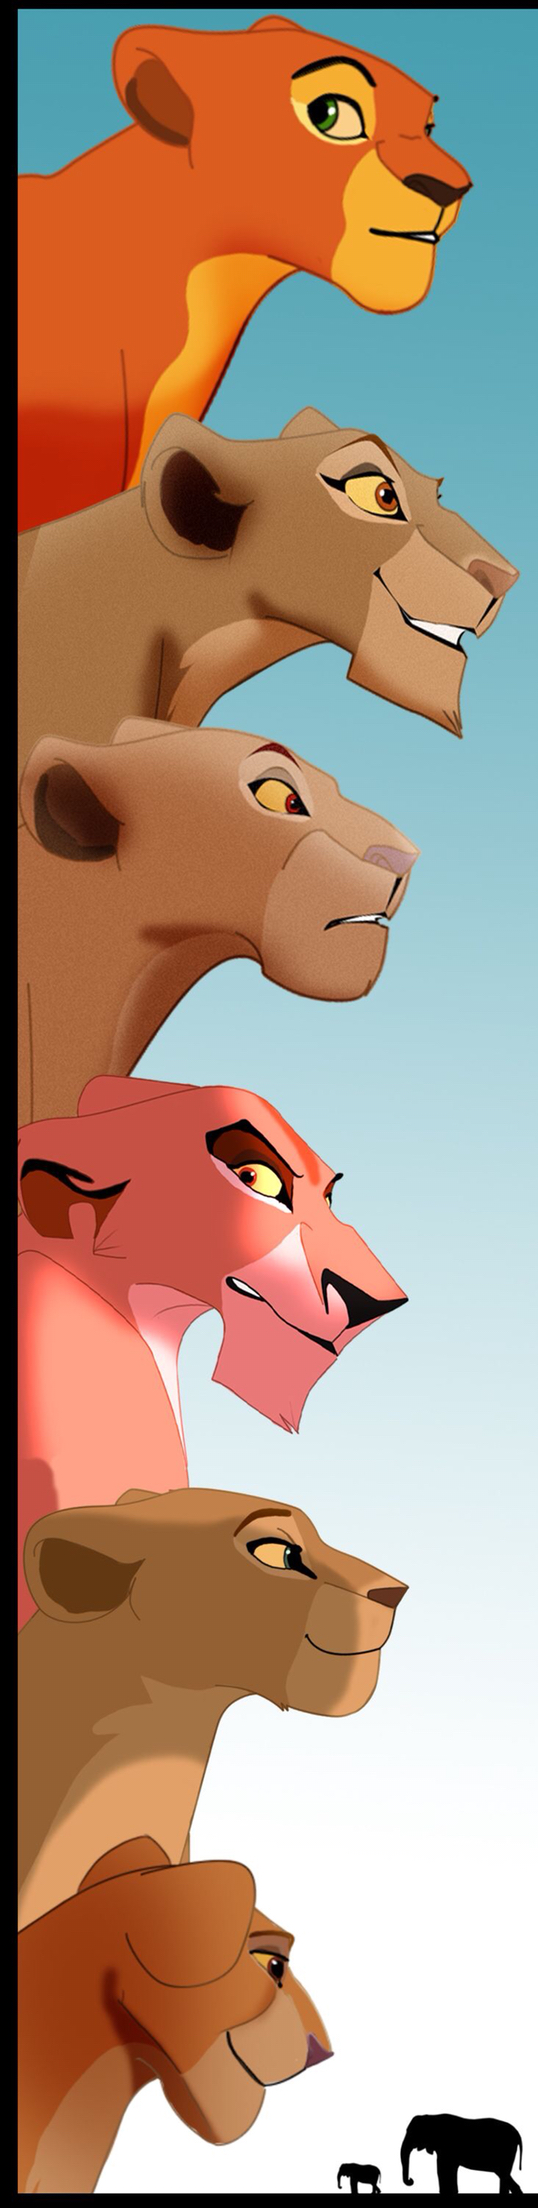 The lion king 2 on lionkingfanclub deviantart kiara kovu from cubs to lovers pinterest timeline and facebook